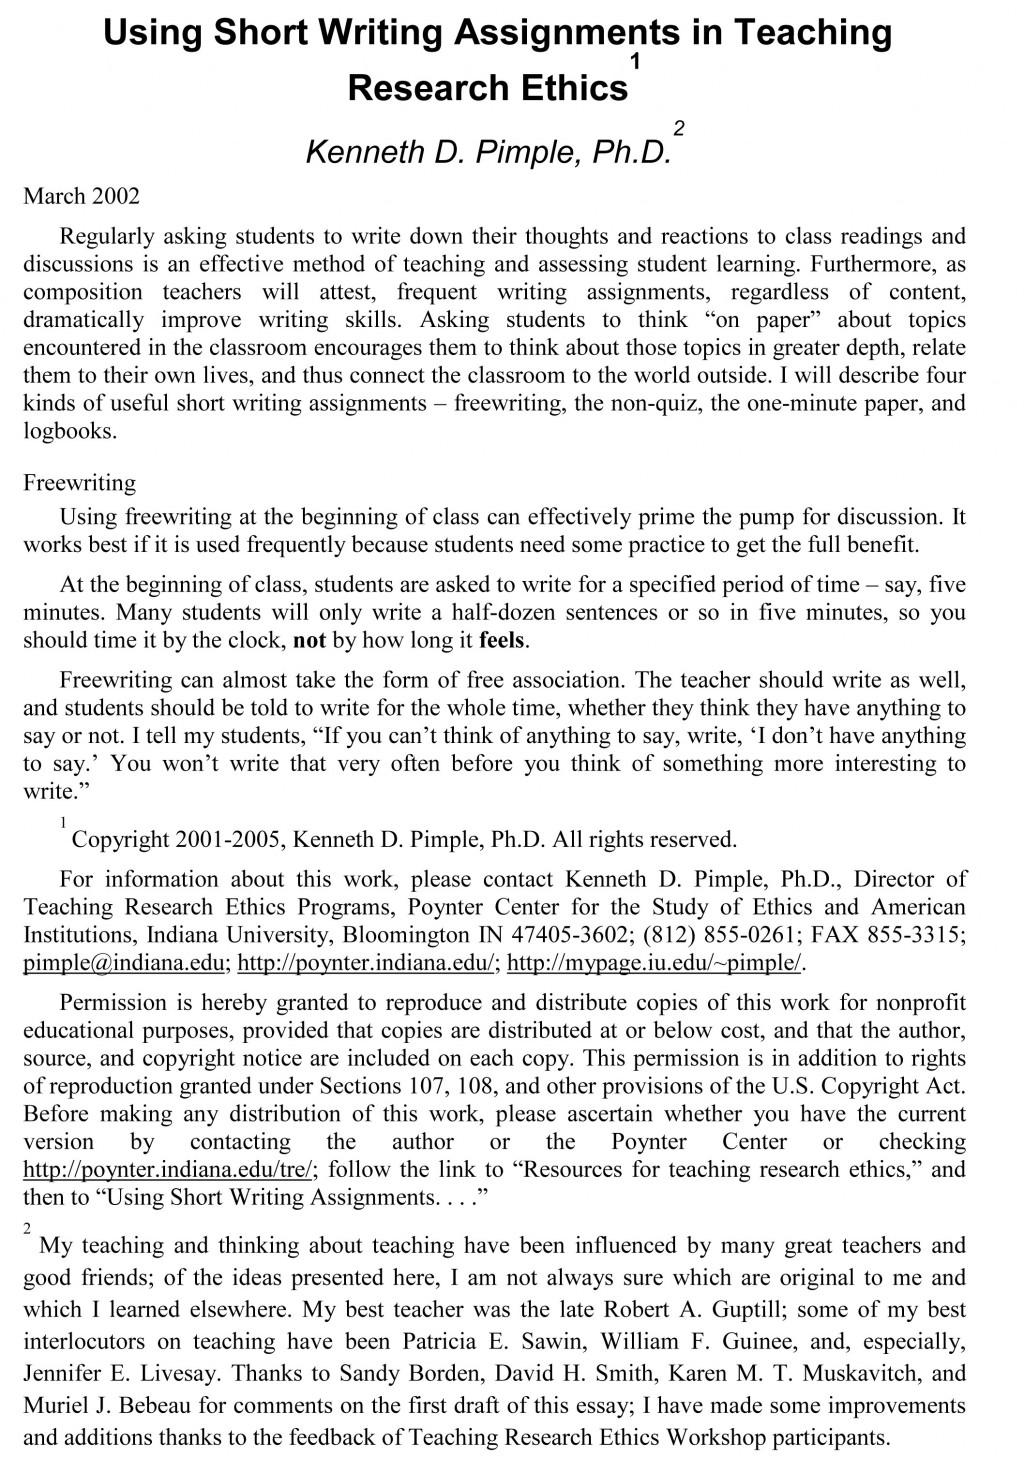 012 Essay Example Diversity Sample Fascinating Law School Large